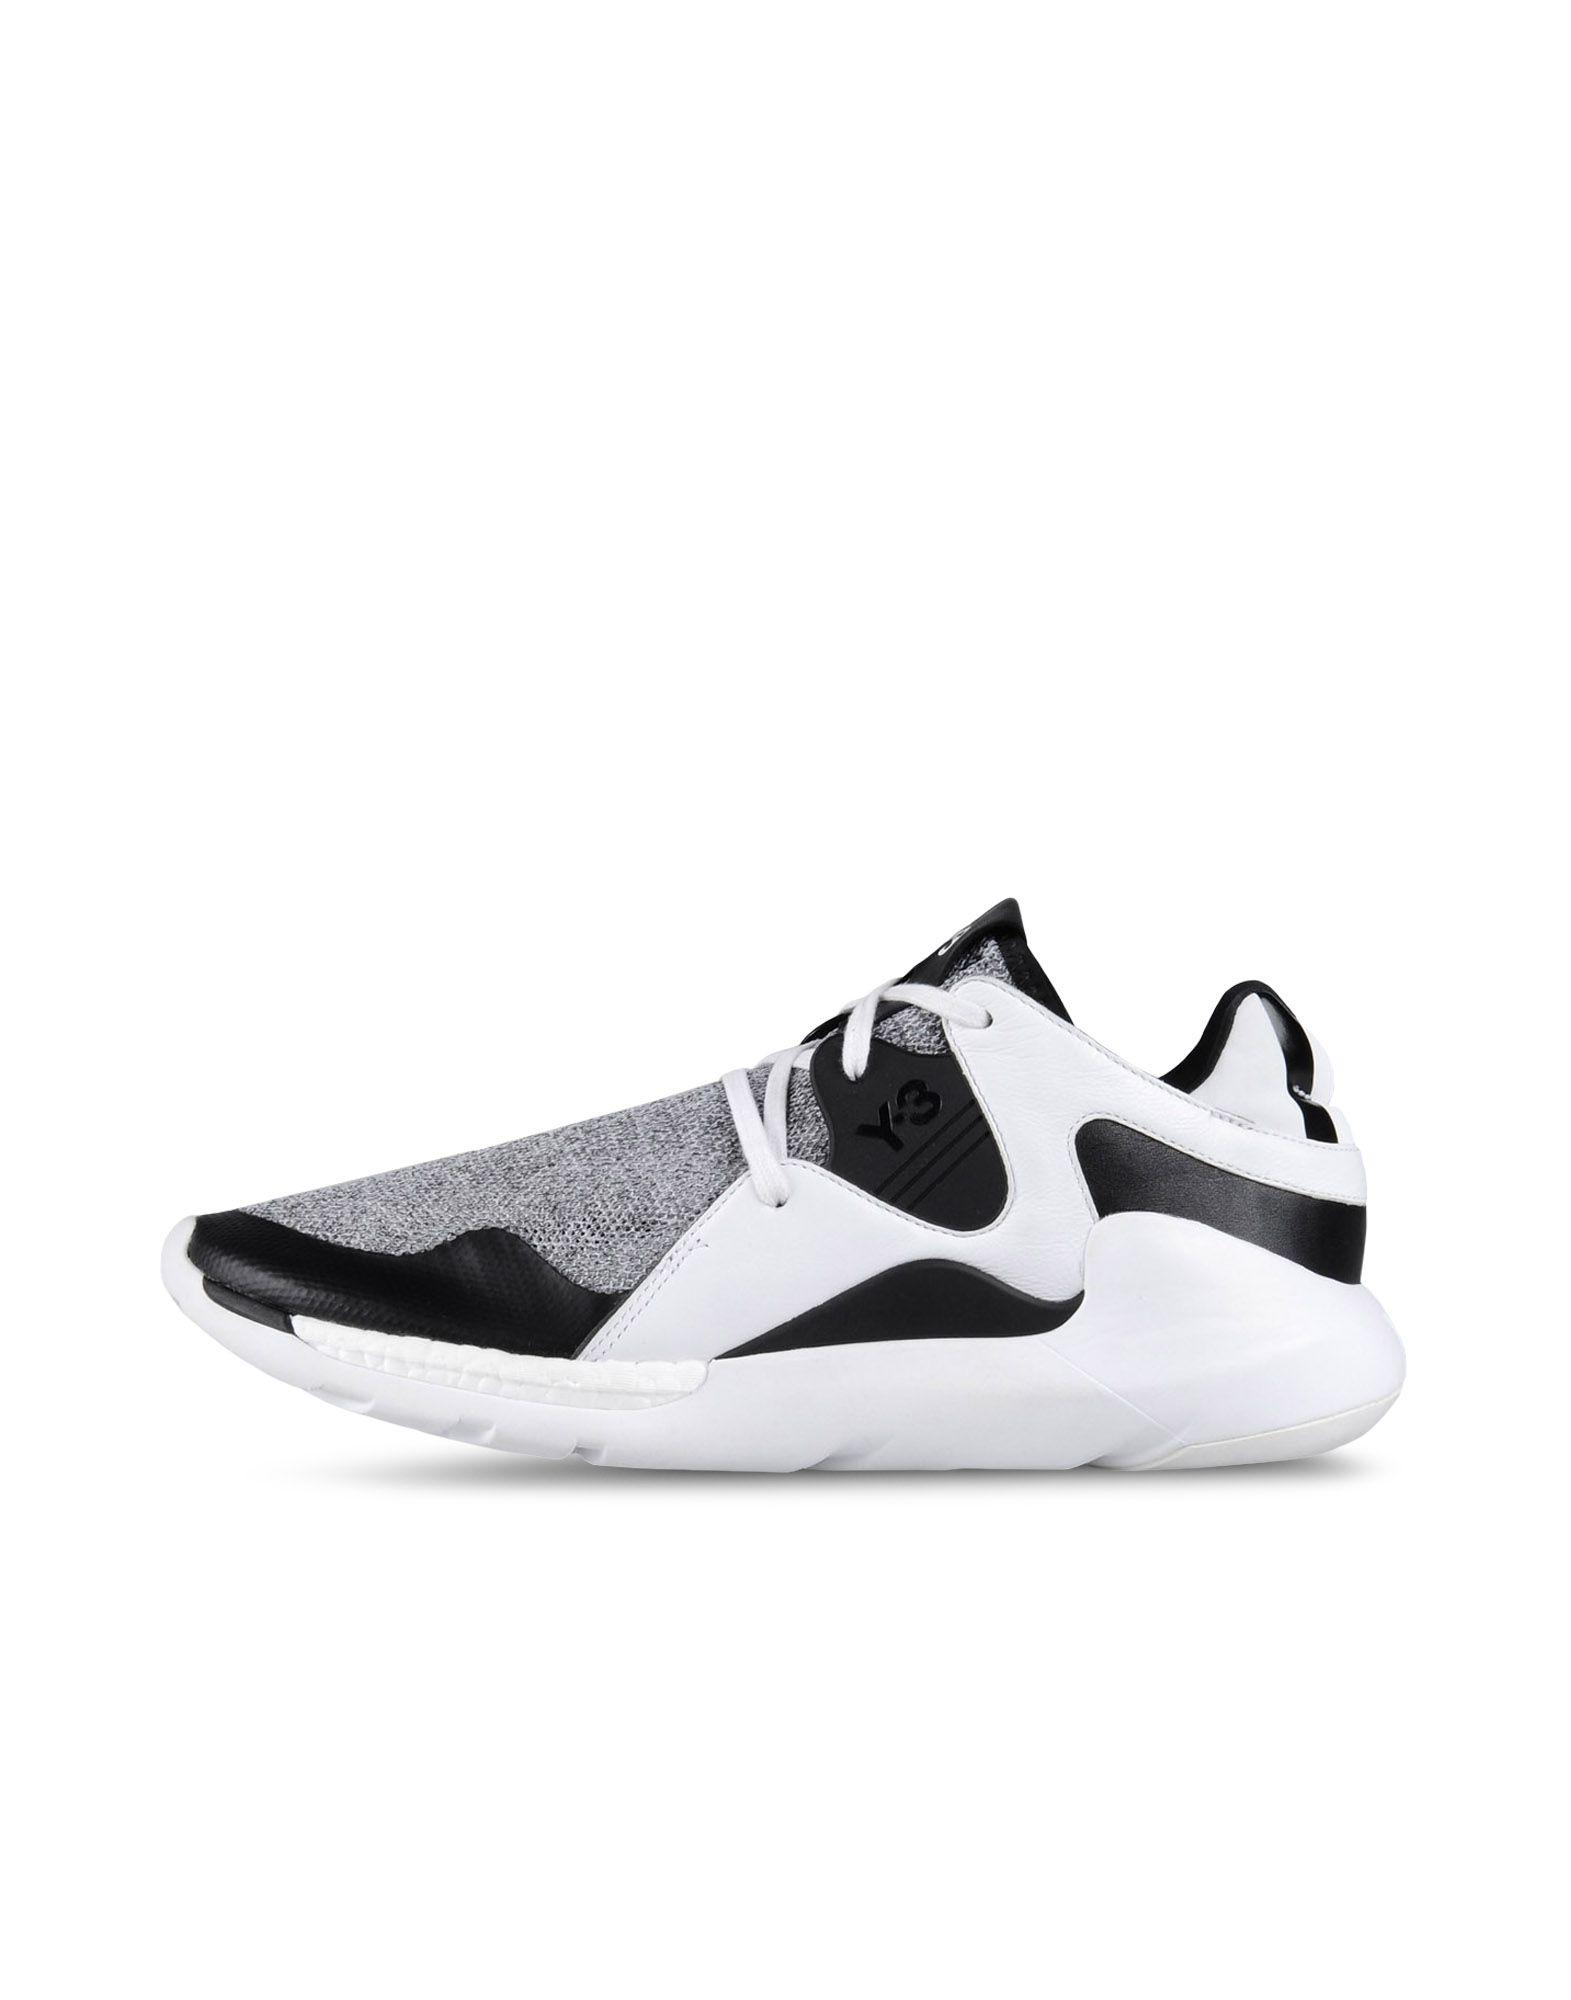 adidas y-3 scarpe